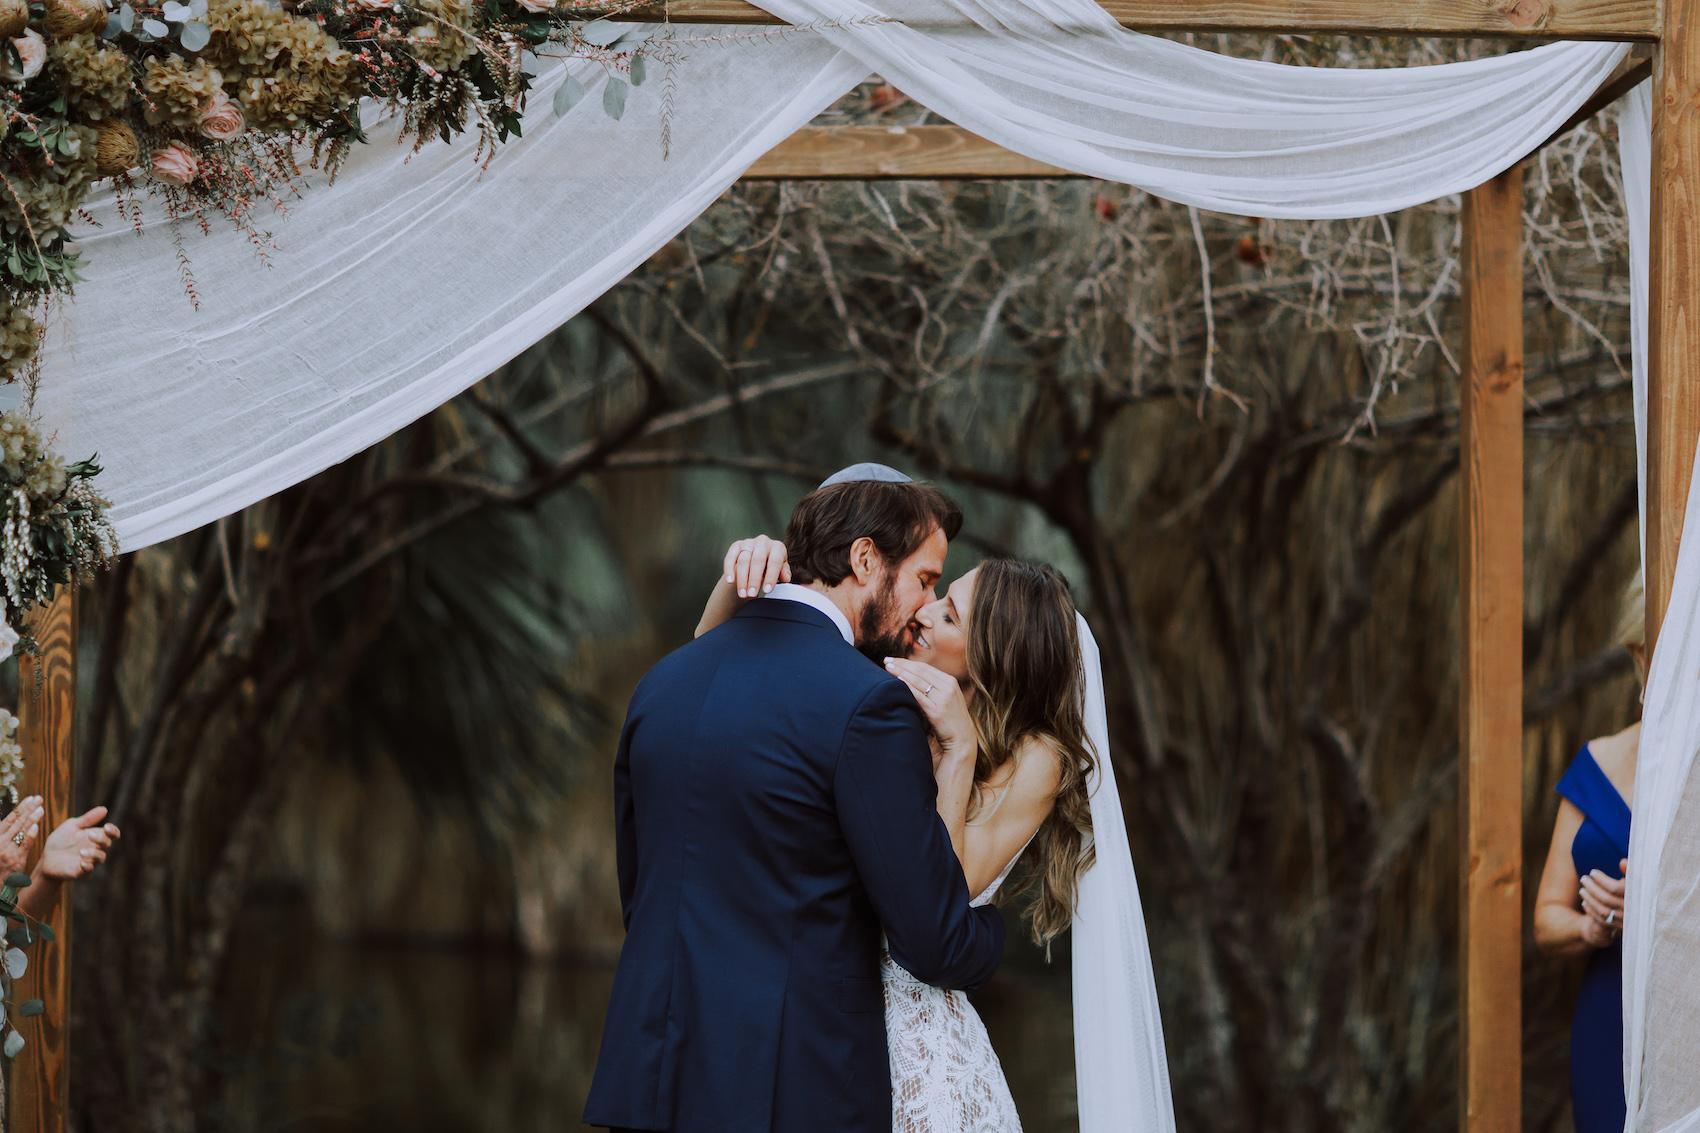 29-Palms-Inn-Joshua-Tree-Jewish-Wedding-H+M-47.jpg